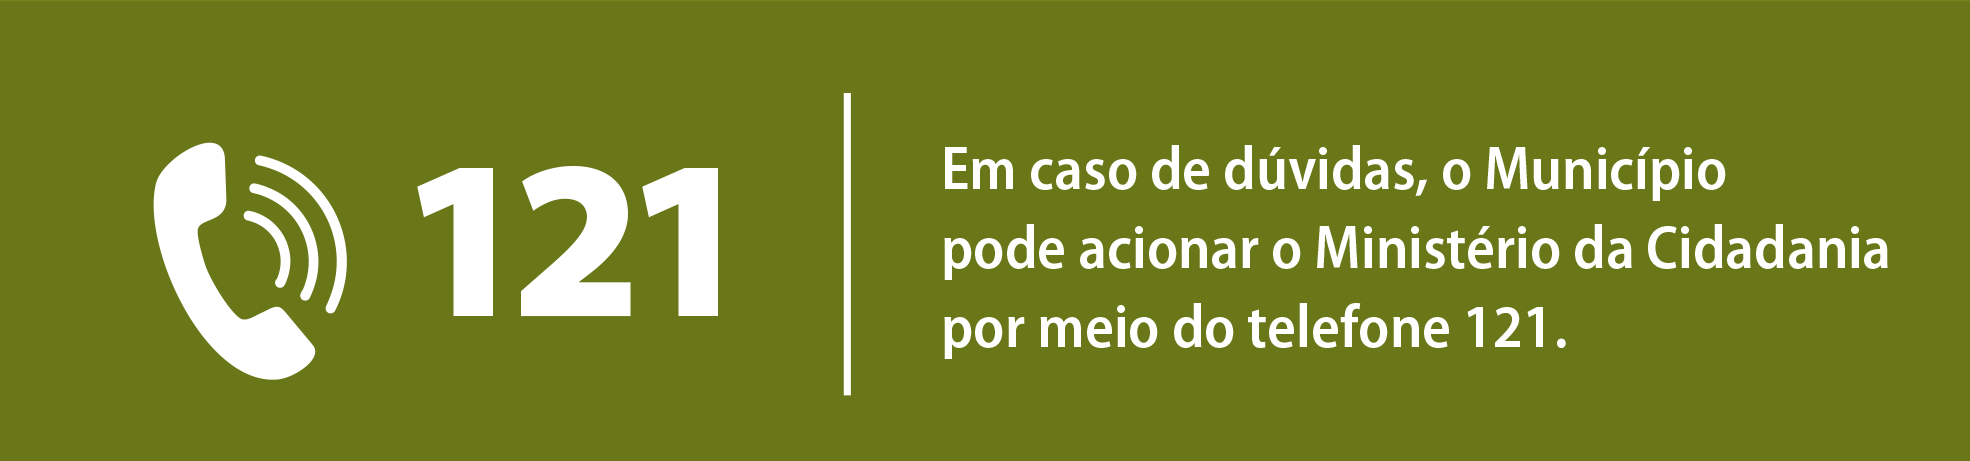 banner pagina campanha interiorizacao 06